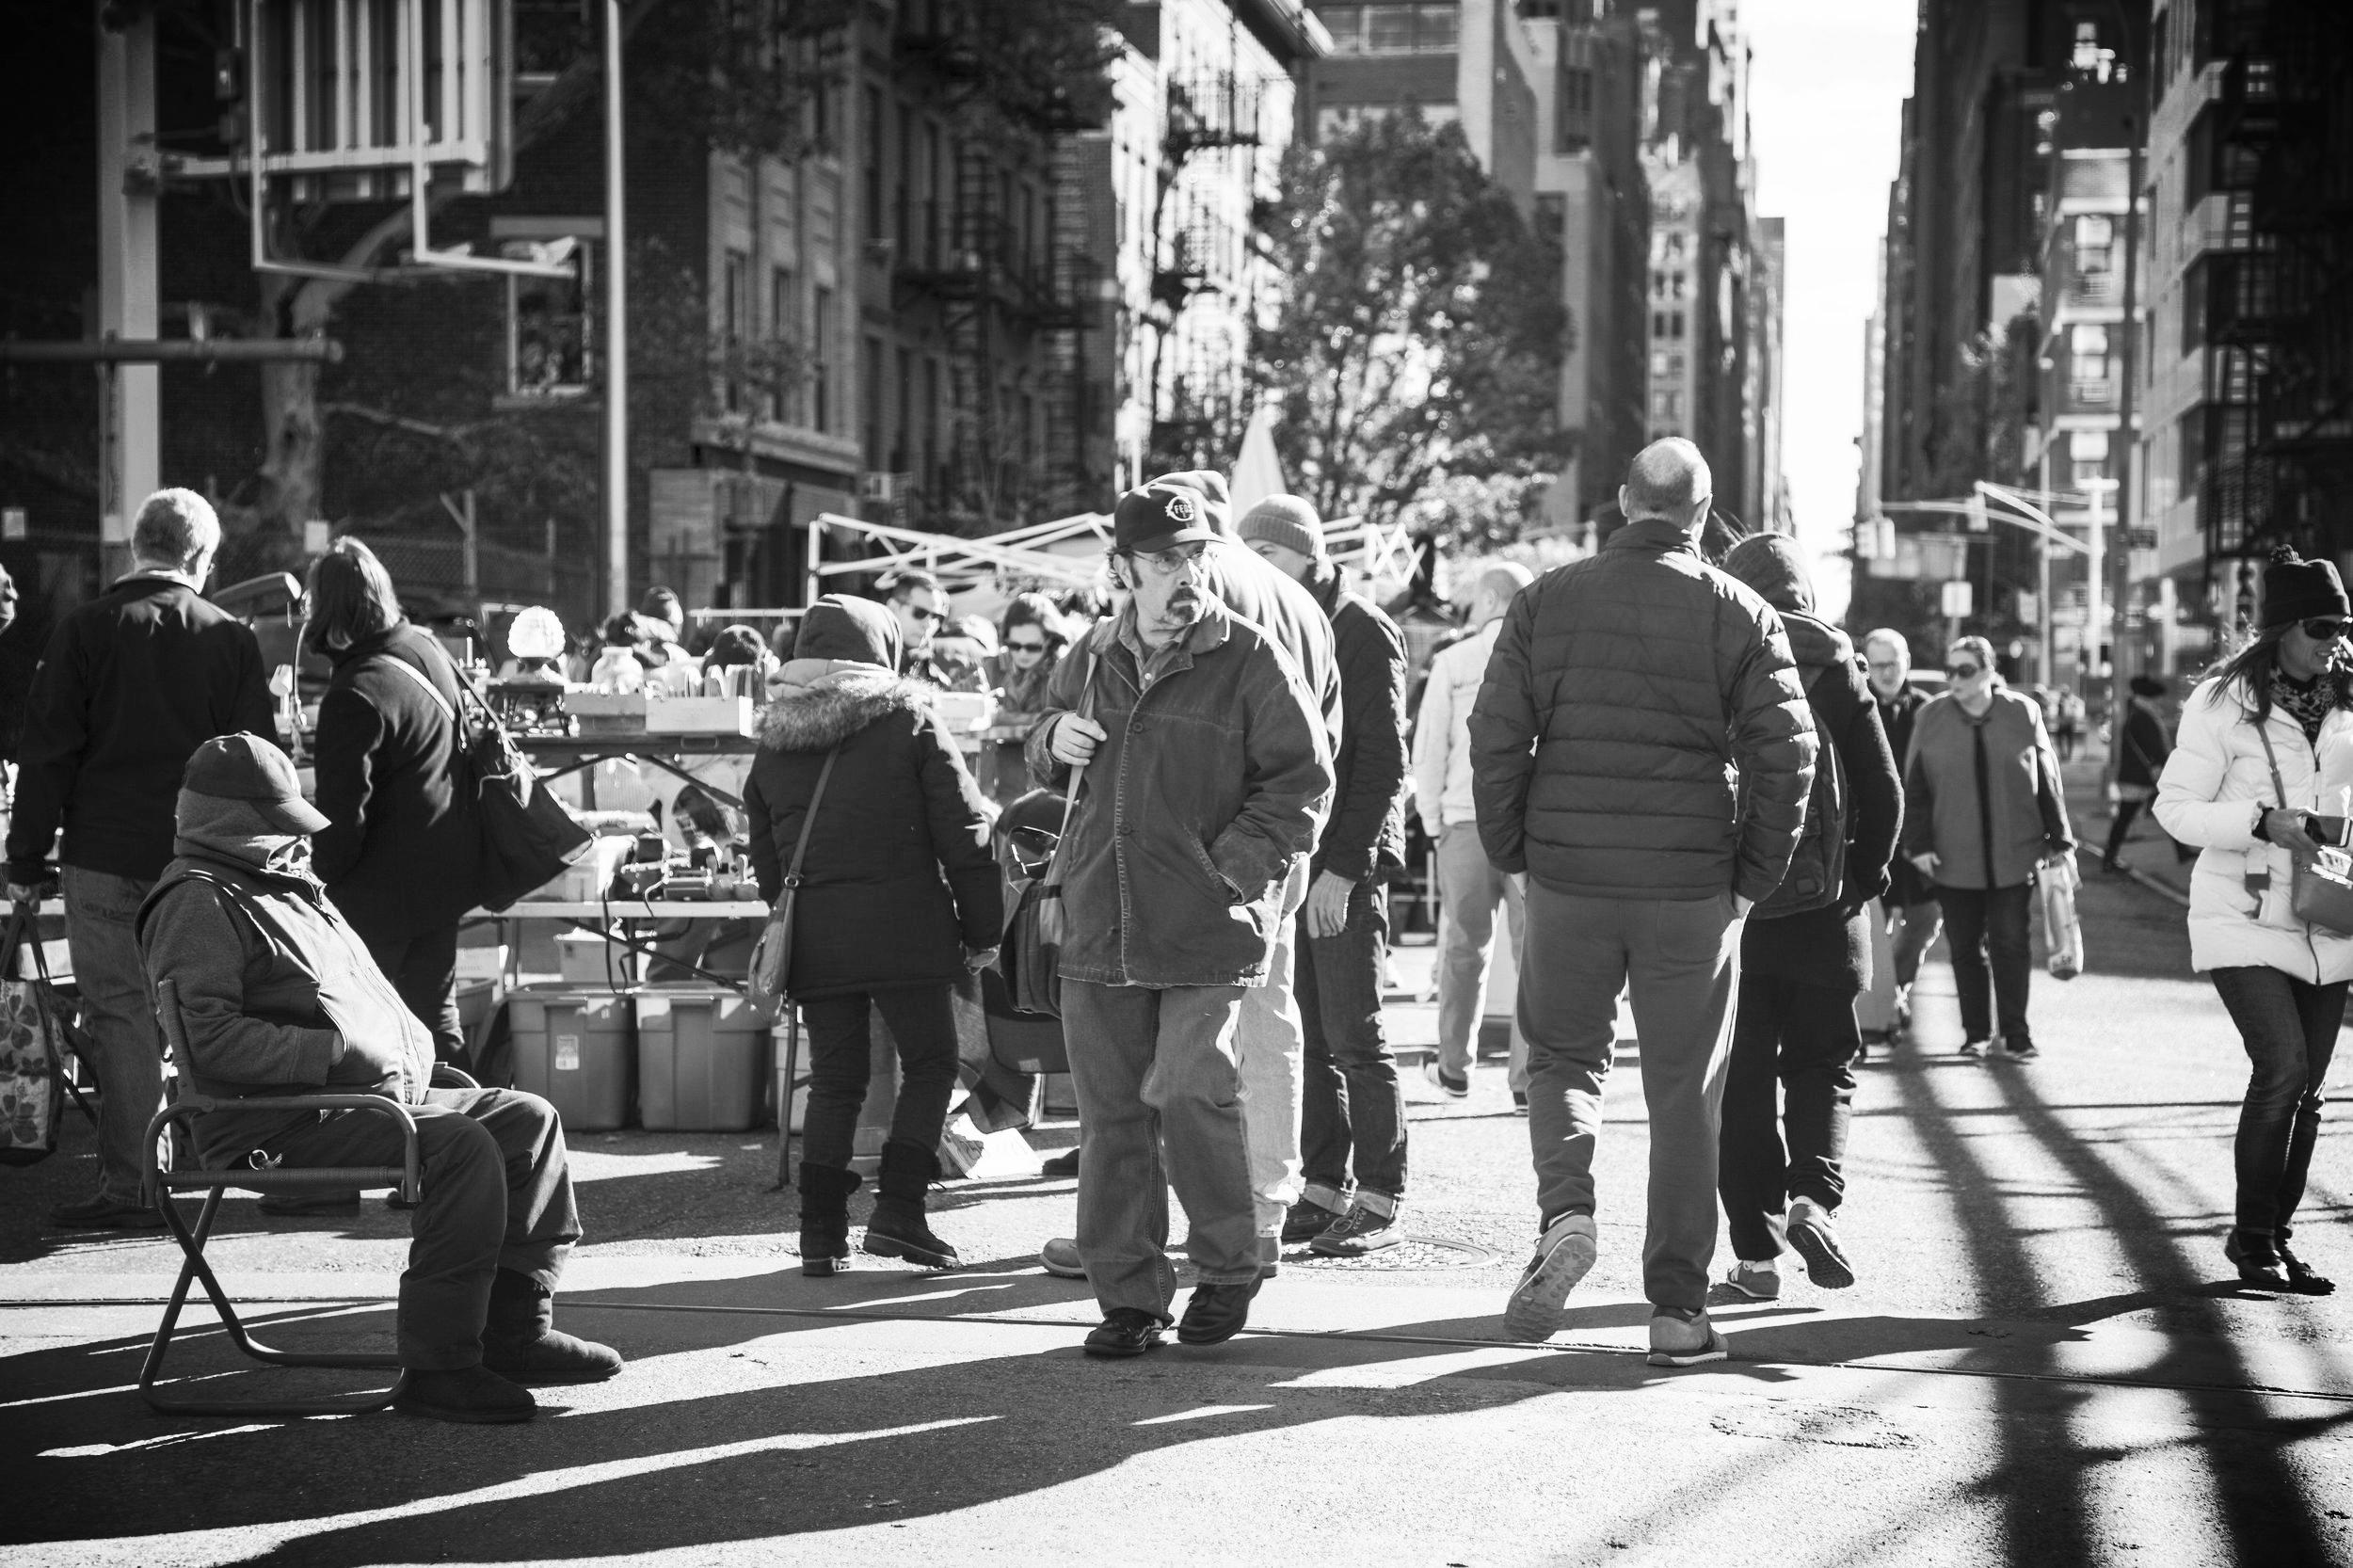 Hell's Kitchen Flea Market History — Annex Markets: Chelsea